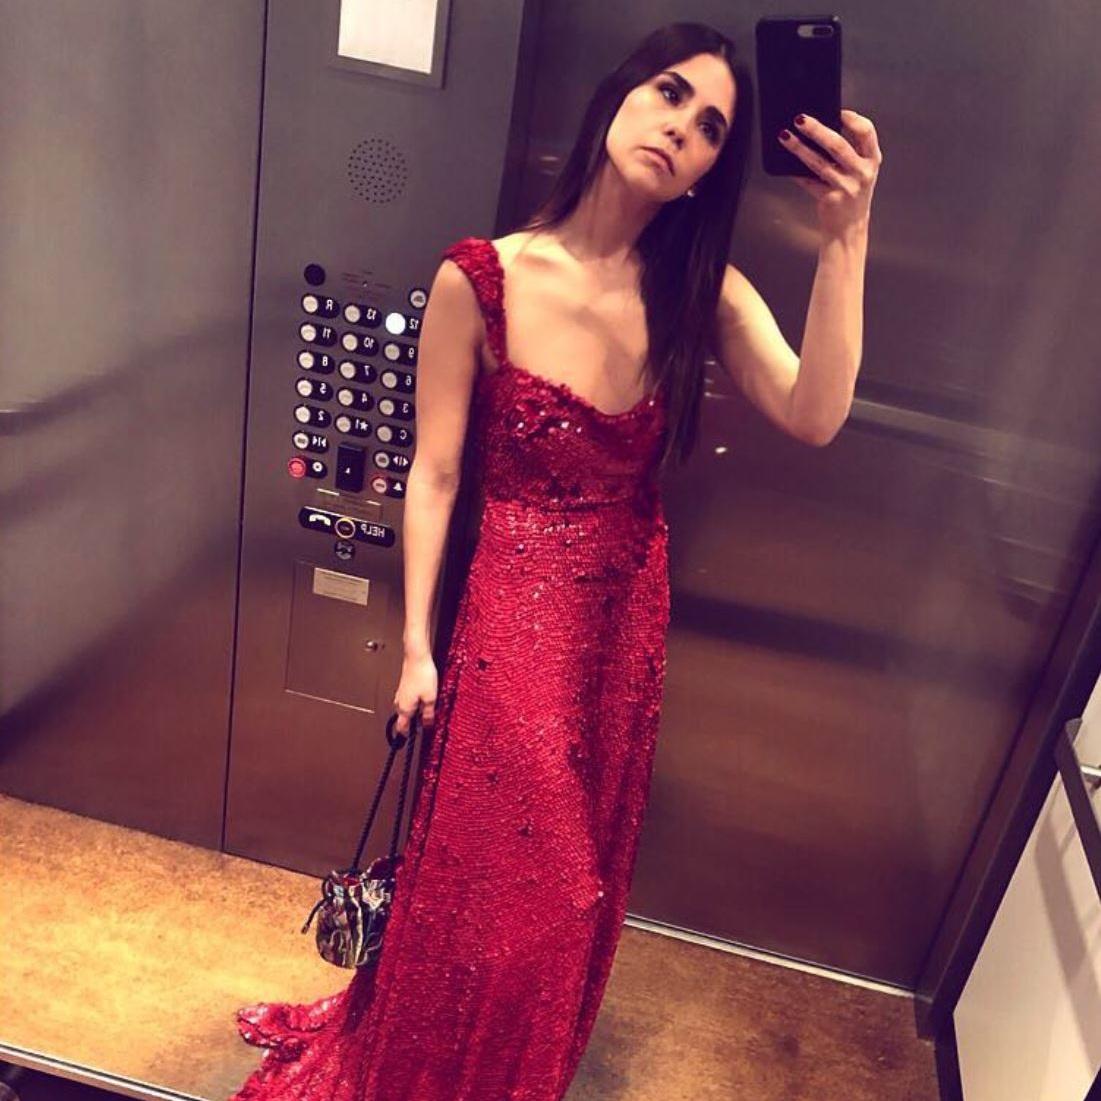 ISABELLA BEHRENS - La Divina Bag  #prmogul #creoconsulting #creative #almagril girlboss  @NYC